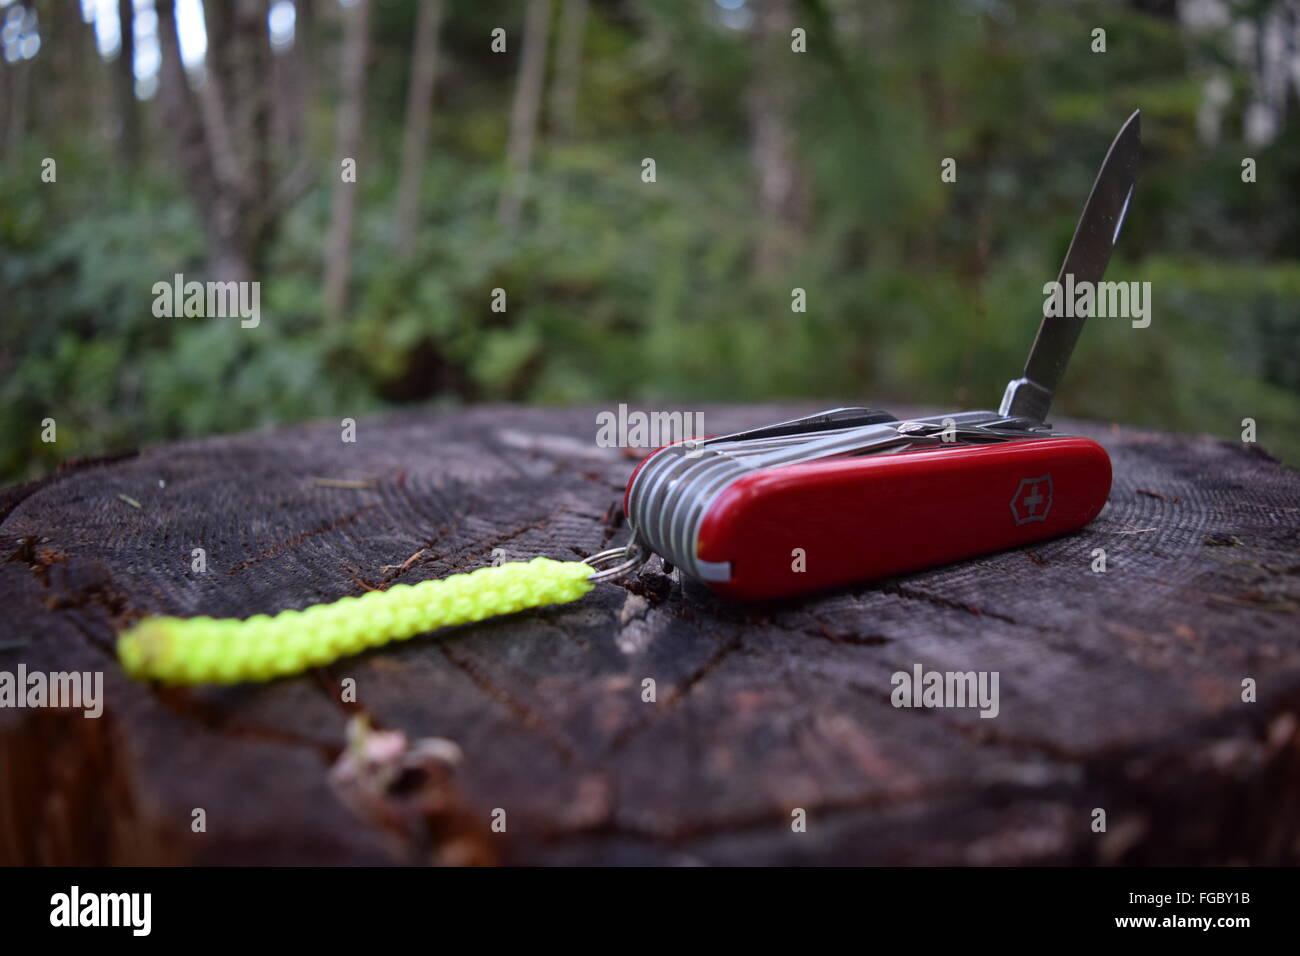 Swiss Army Knife on tree stump - Stock Image